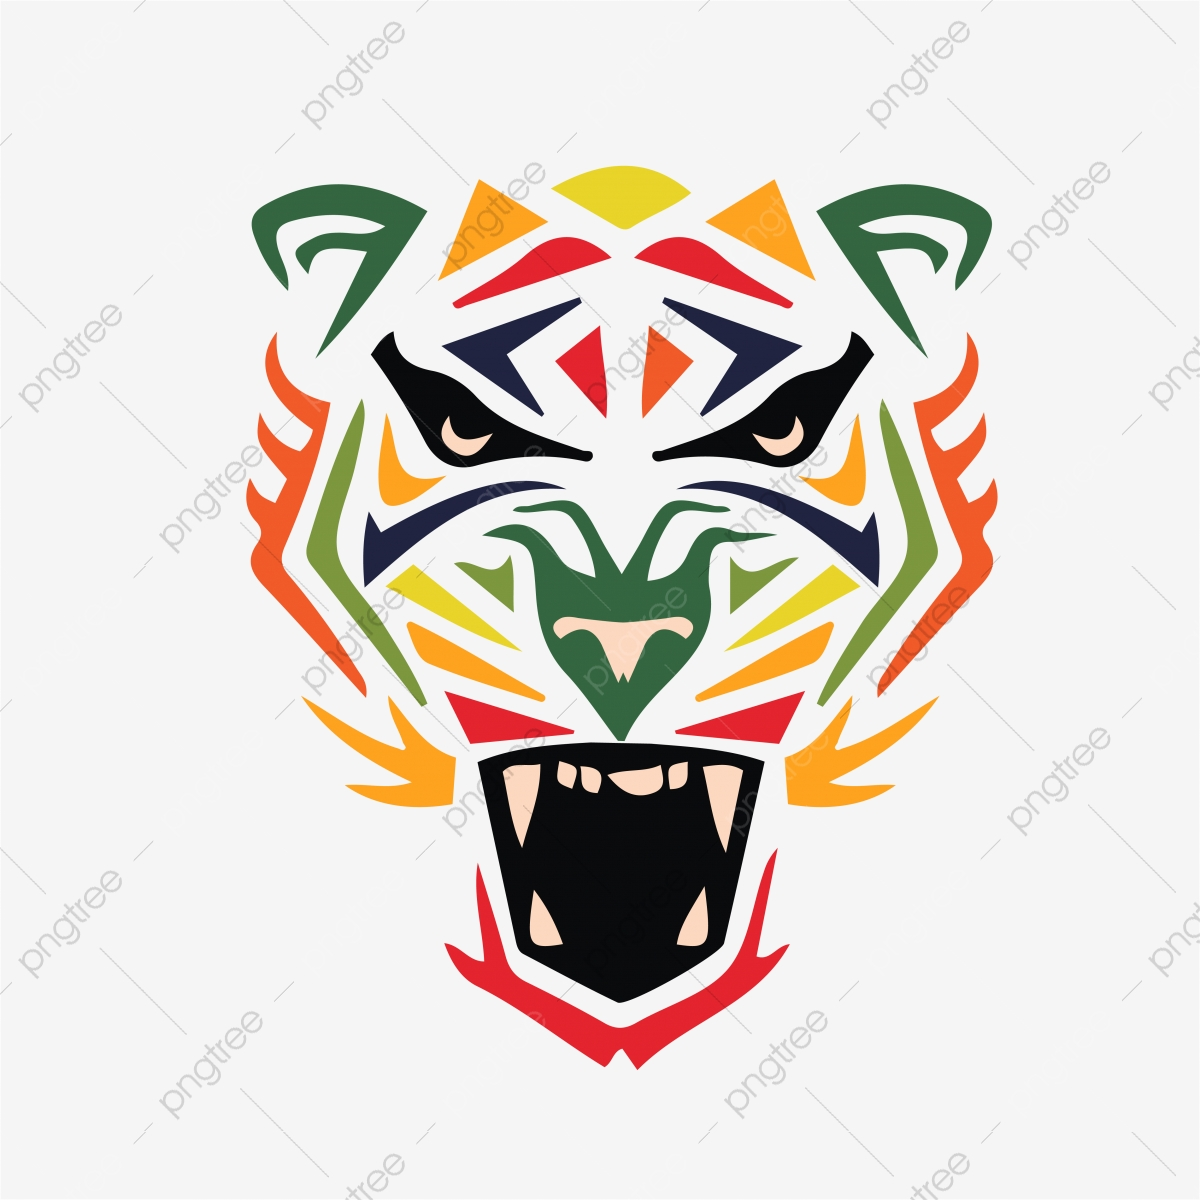 Mewarnai Harimau Wajah Reka Bentuk Template Latar Belakang